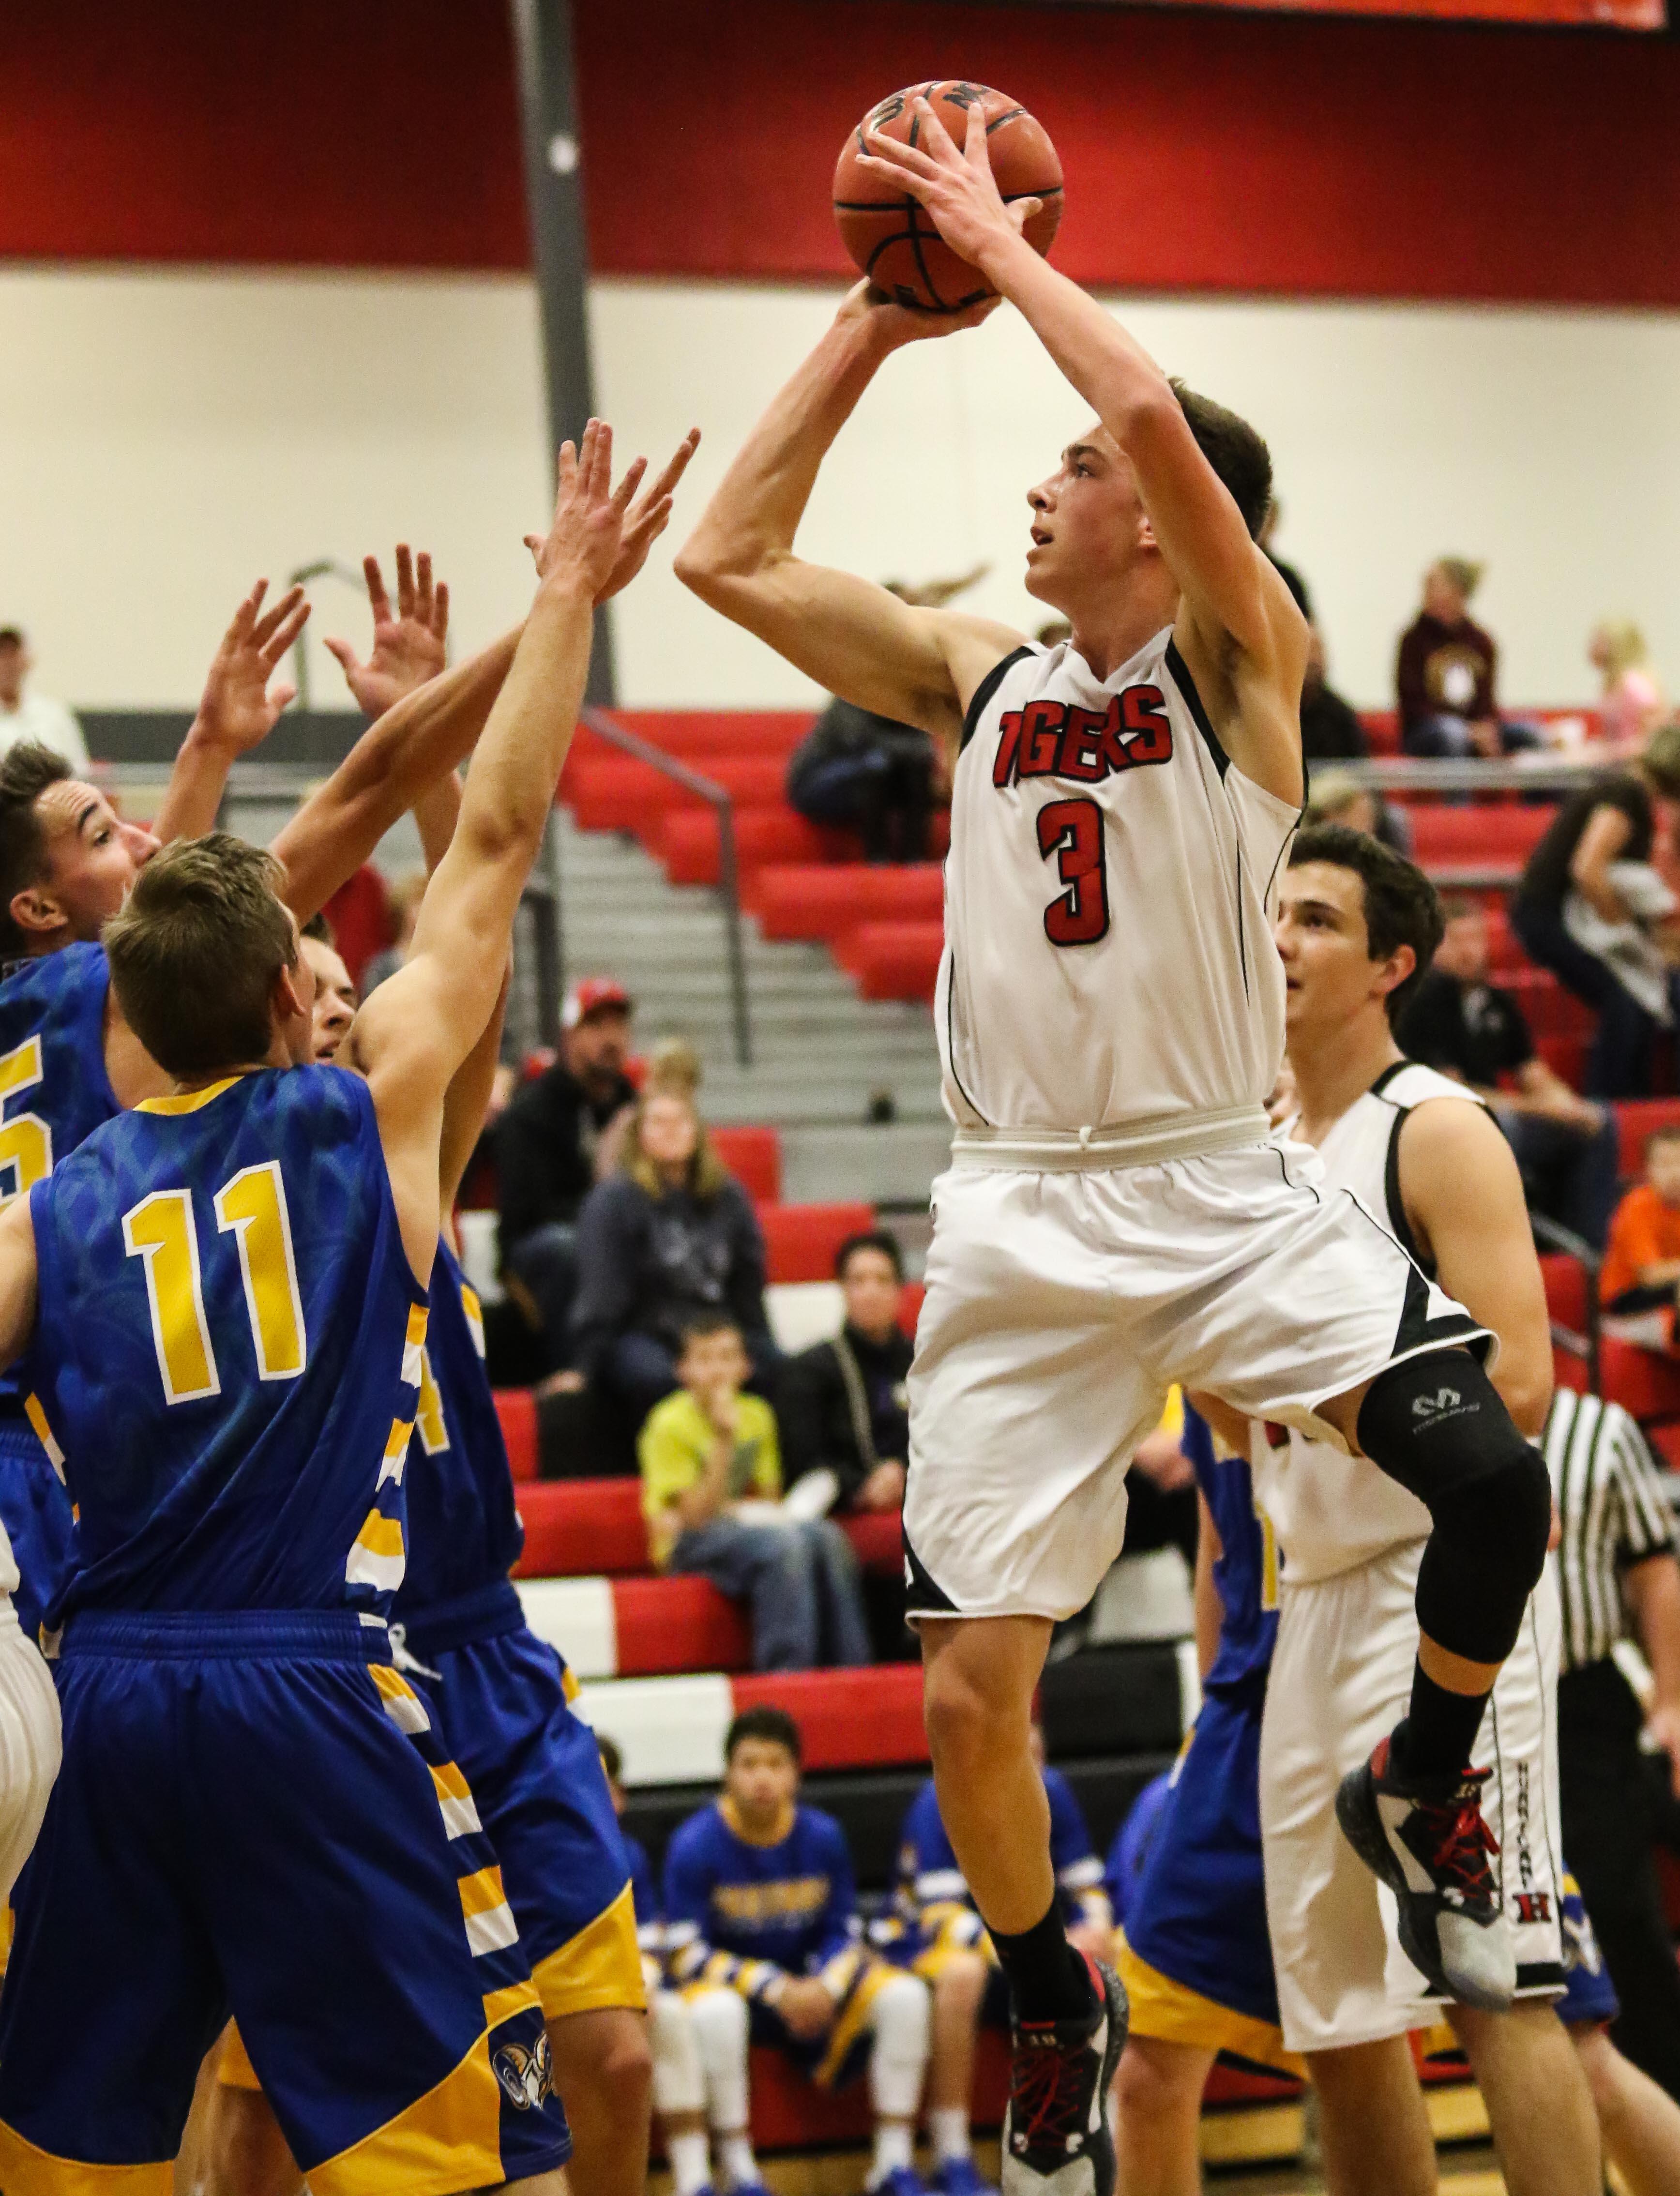 Hurricane's Jackson Last (3), Hurricane vs Parowan, Boy's Basketball, St. George, Utah, Dec, 20, 2016, | Photo by Kevin Luthy, St. George News